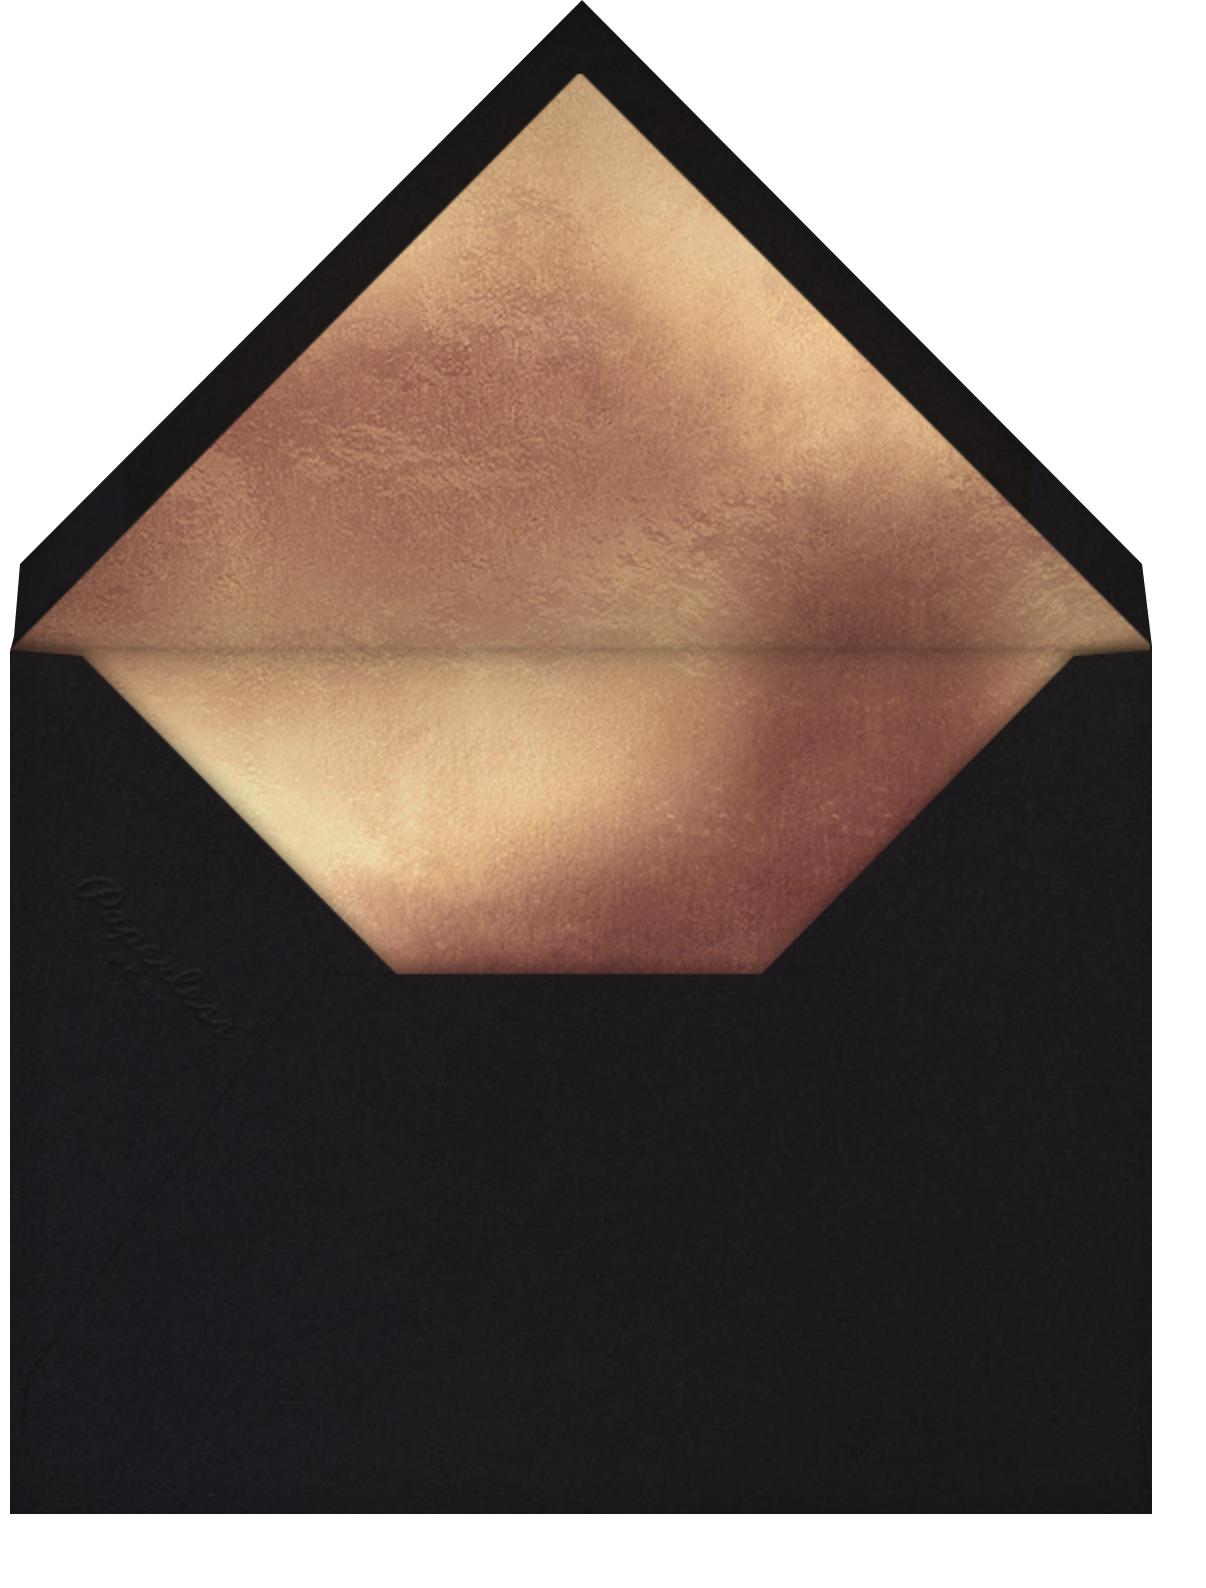 Stellar Birthday - Rifle Paper Co. - Envelope